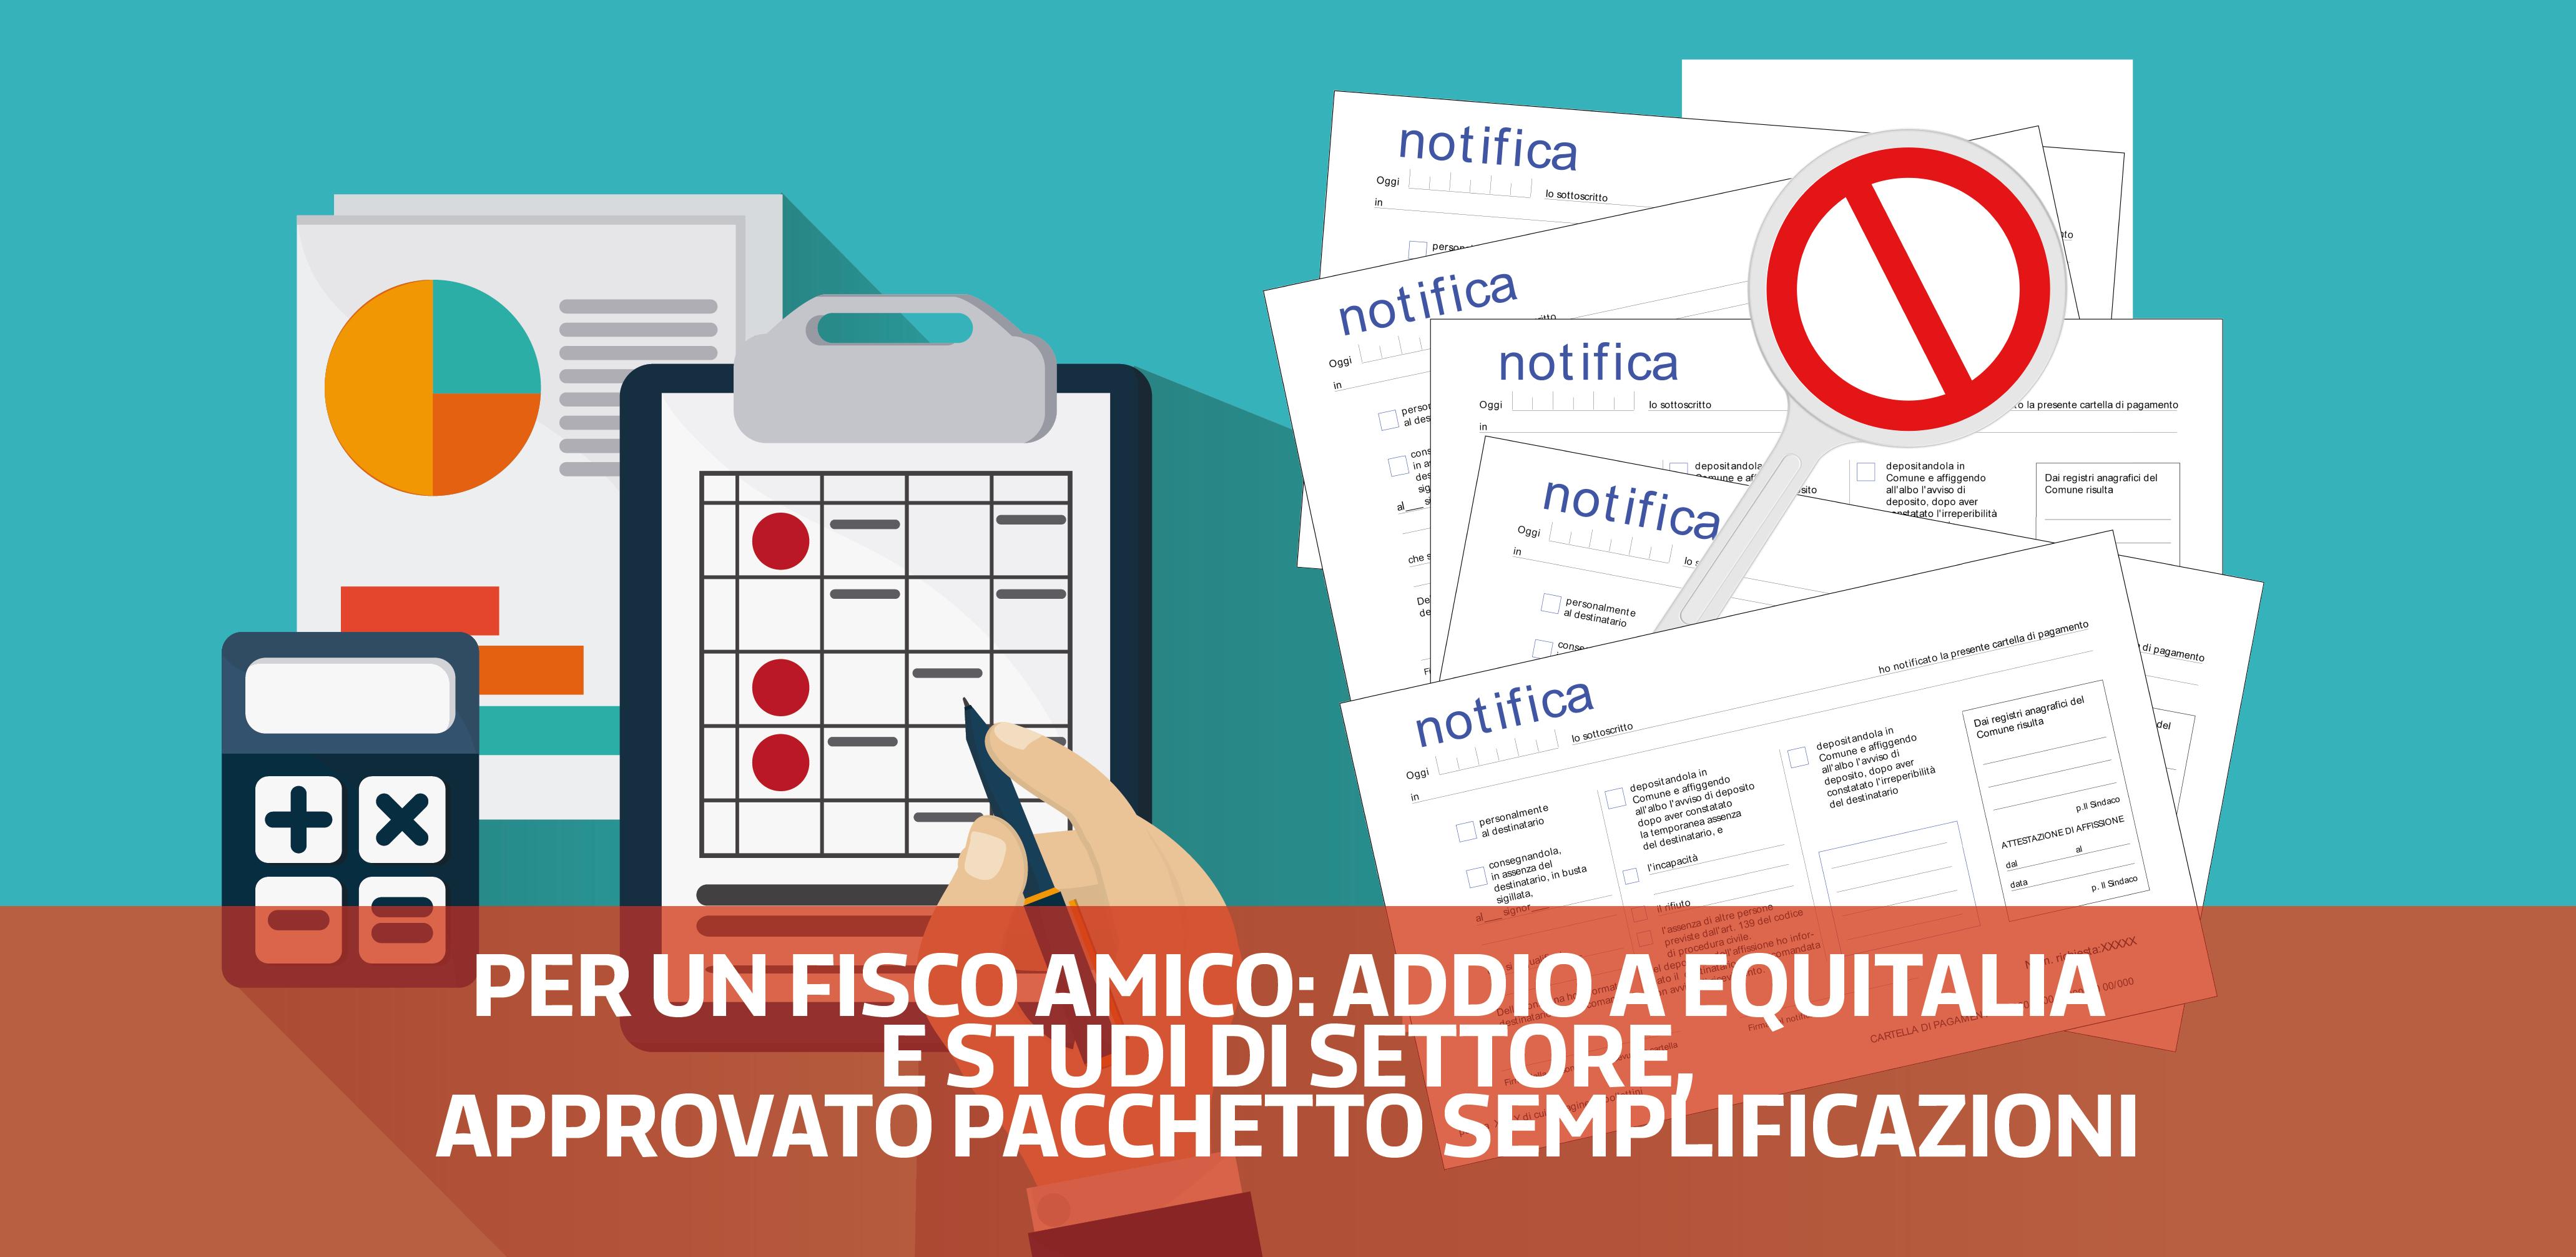 Decreto fiscale gruppo pd camera dei deputati news for Calendario camera deputati